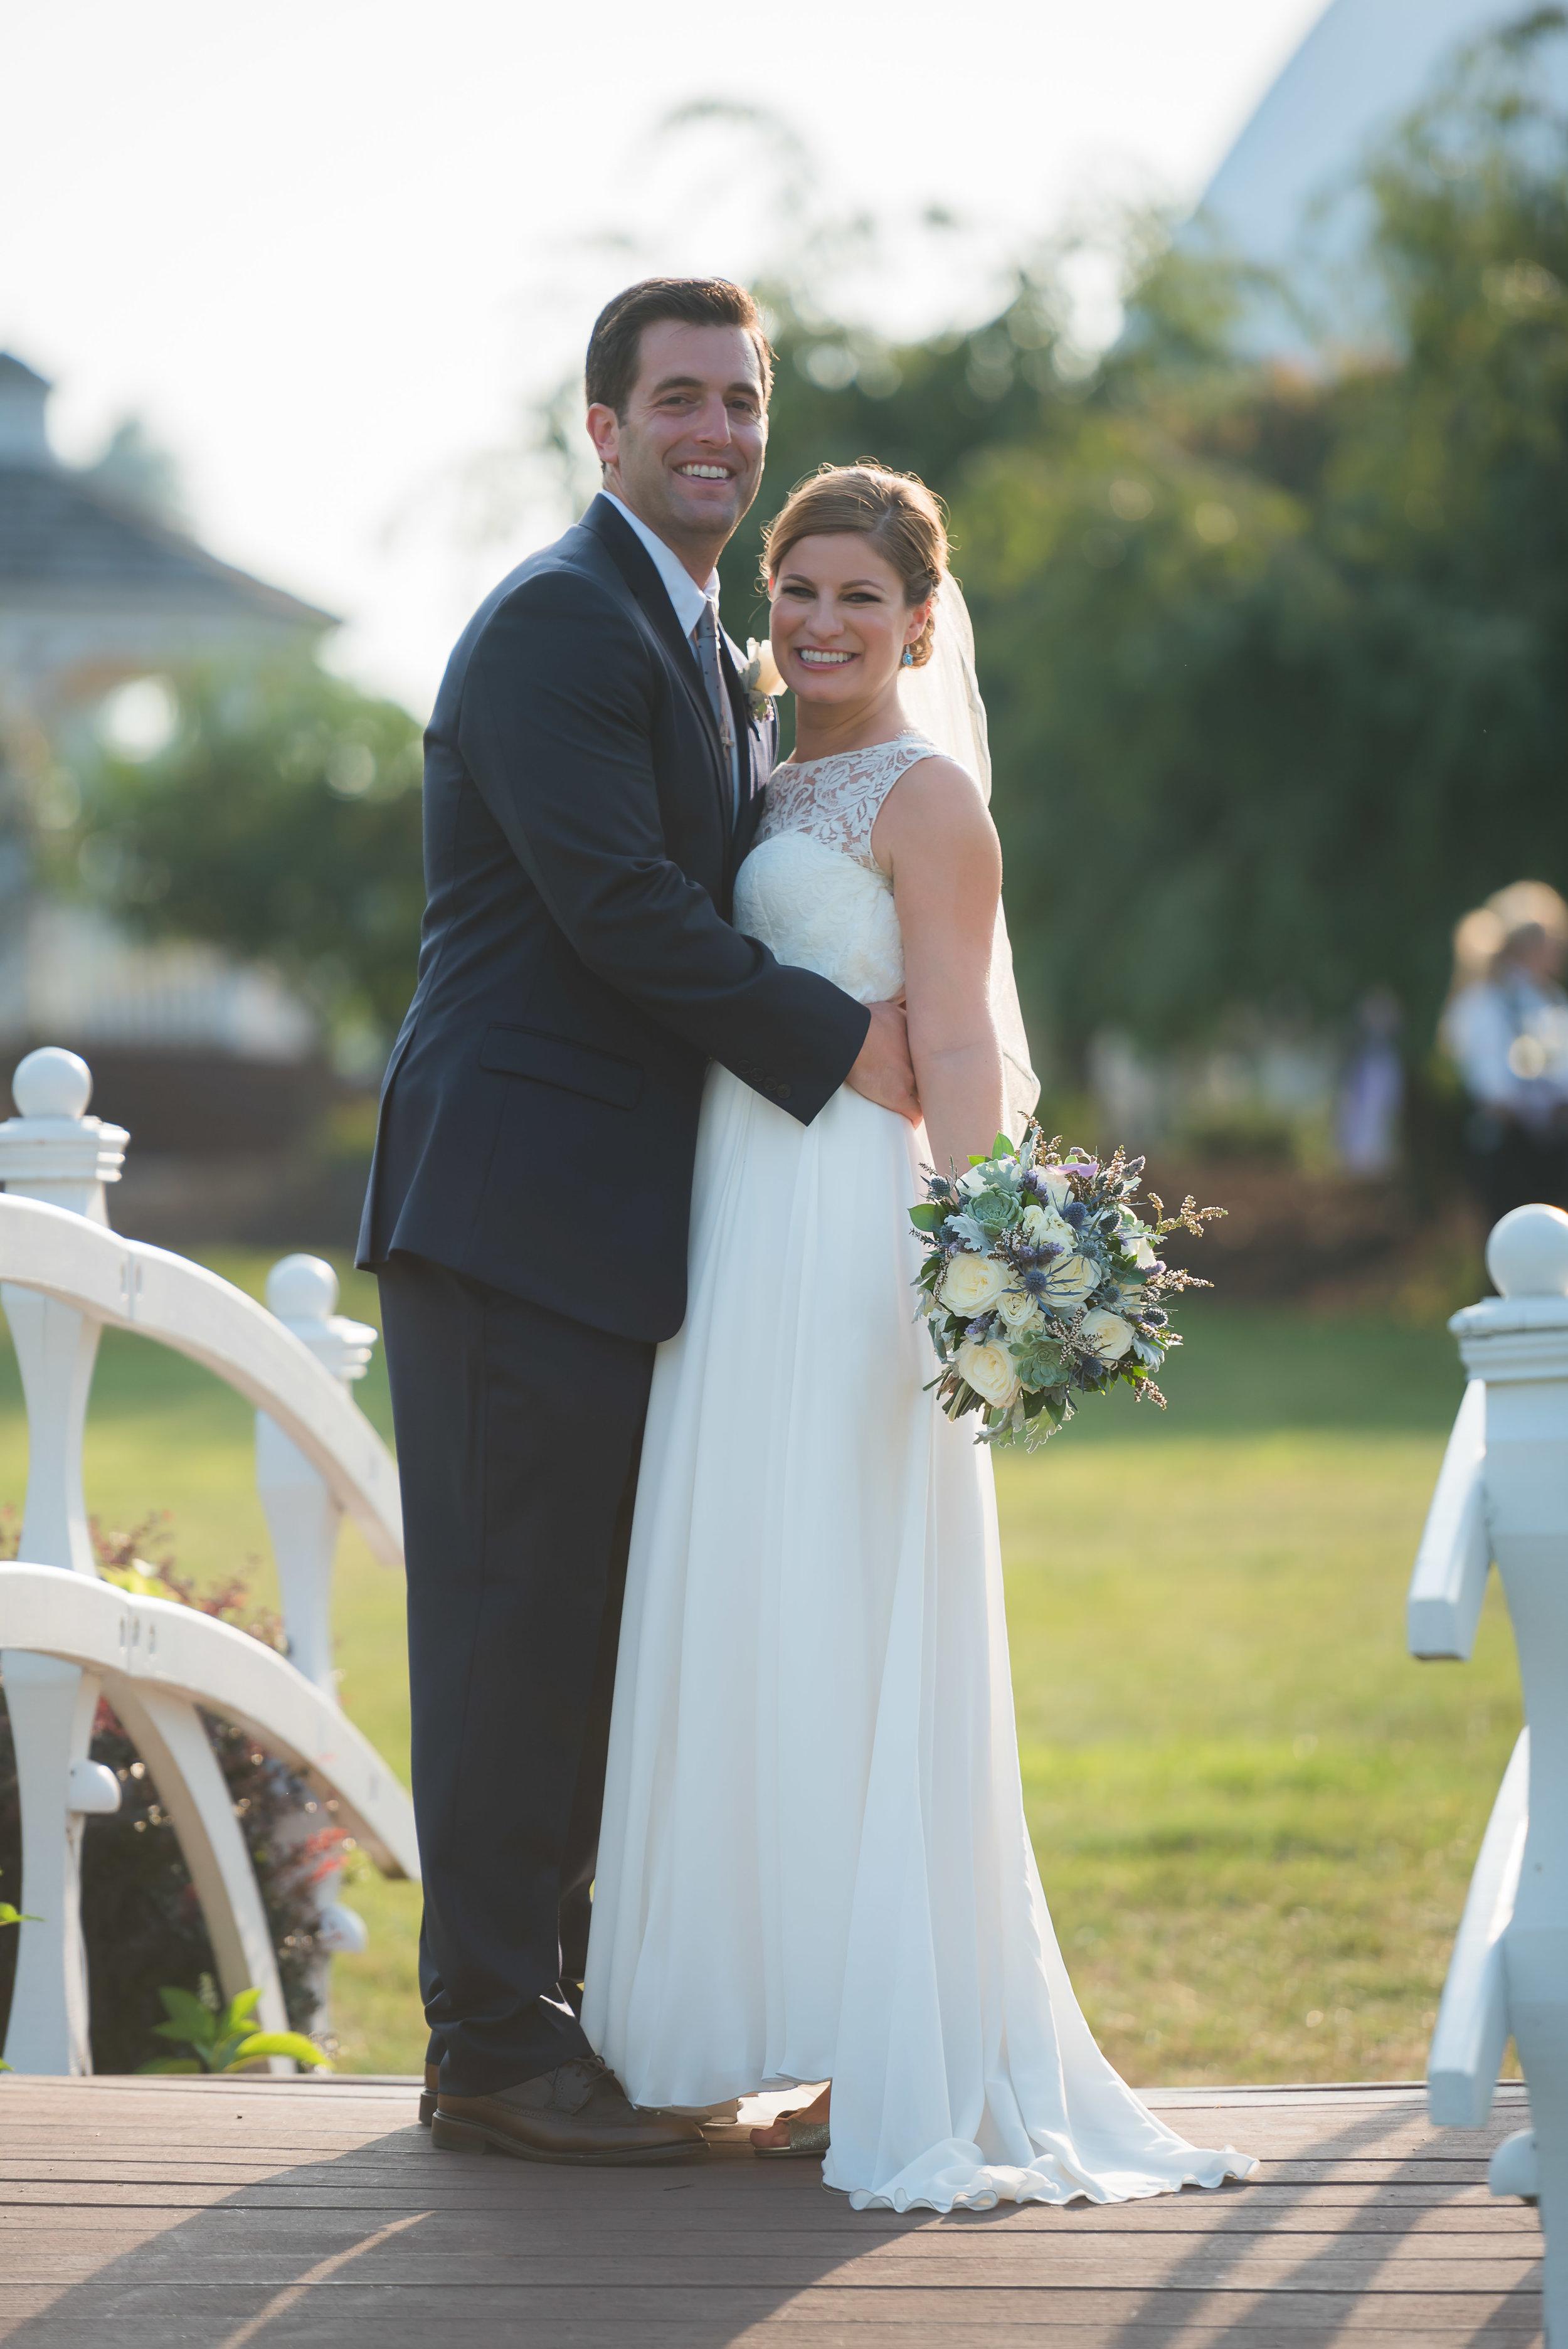 brandywine-wedding-tessie-reveliotis-photography-beautiful-and-blessed-events-031